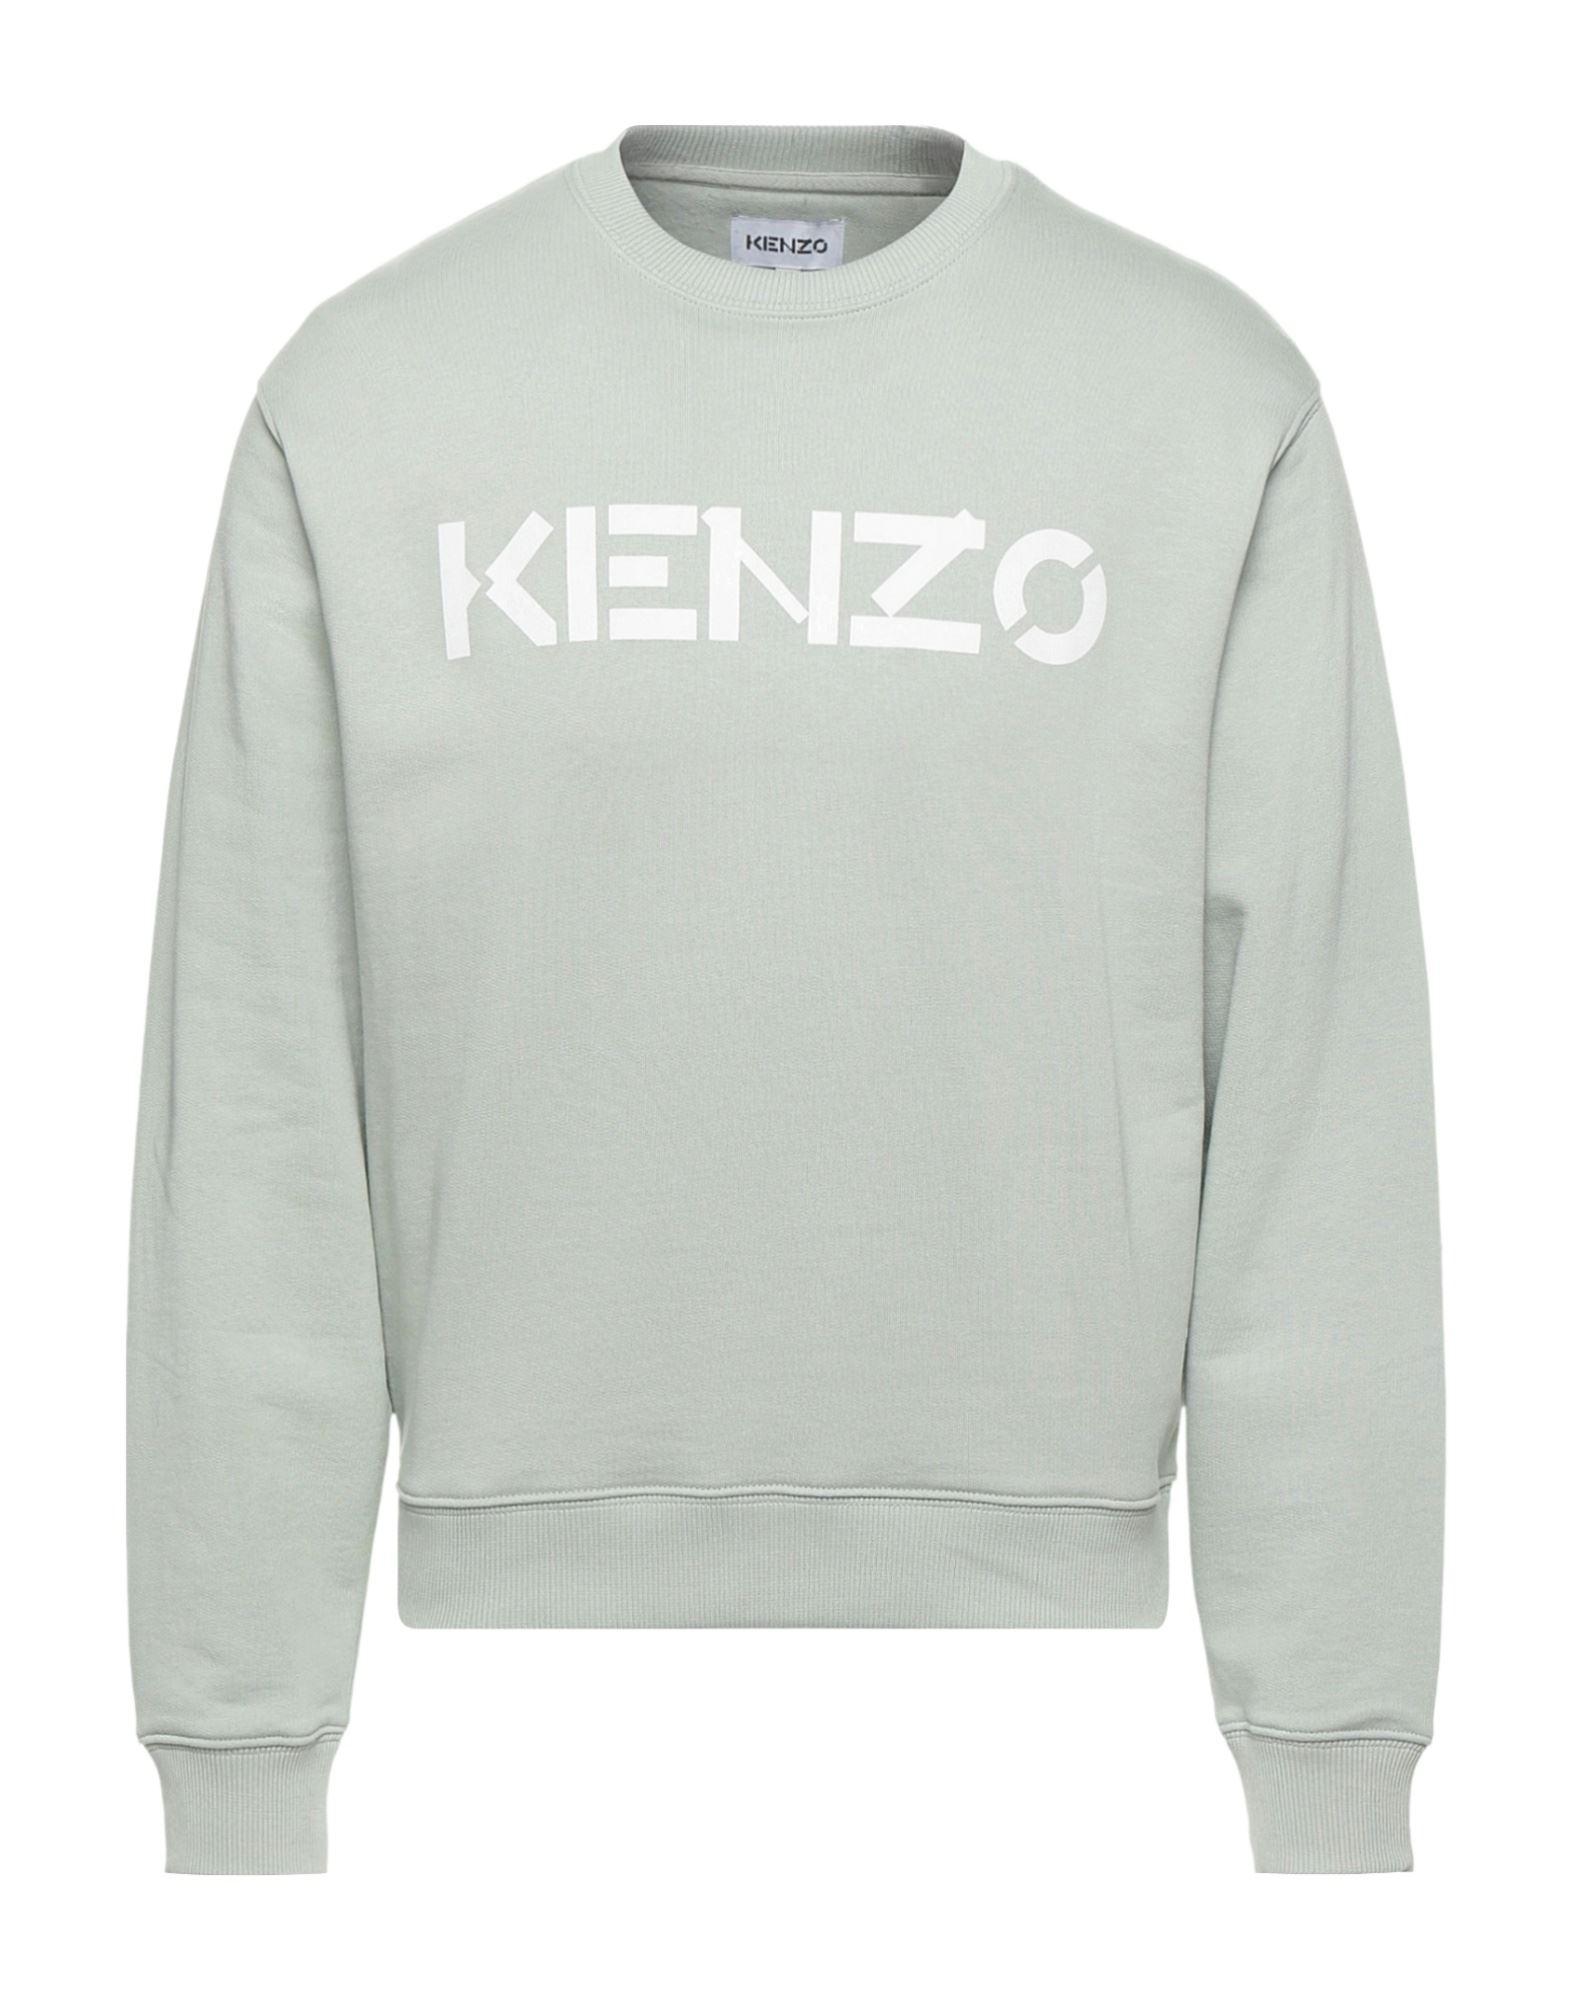 Фото - KENZO Толстовка толстовка kenzo размер 92 серый